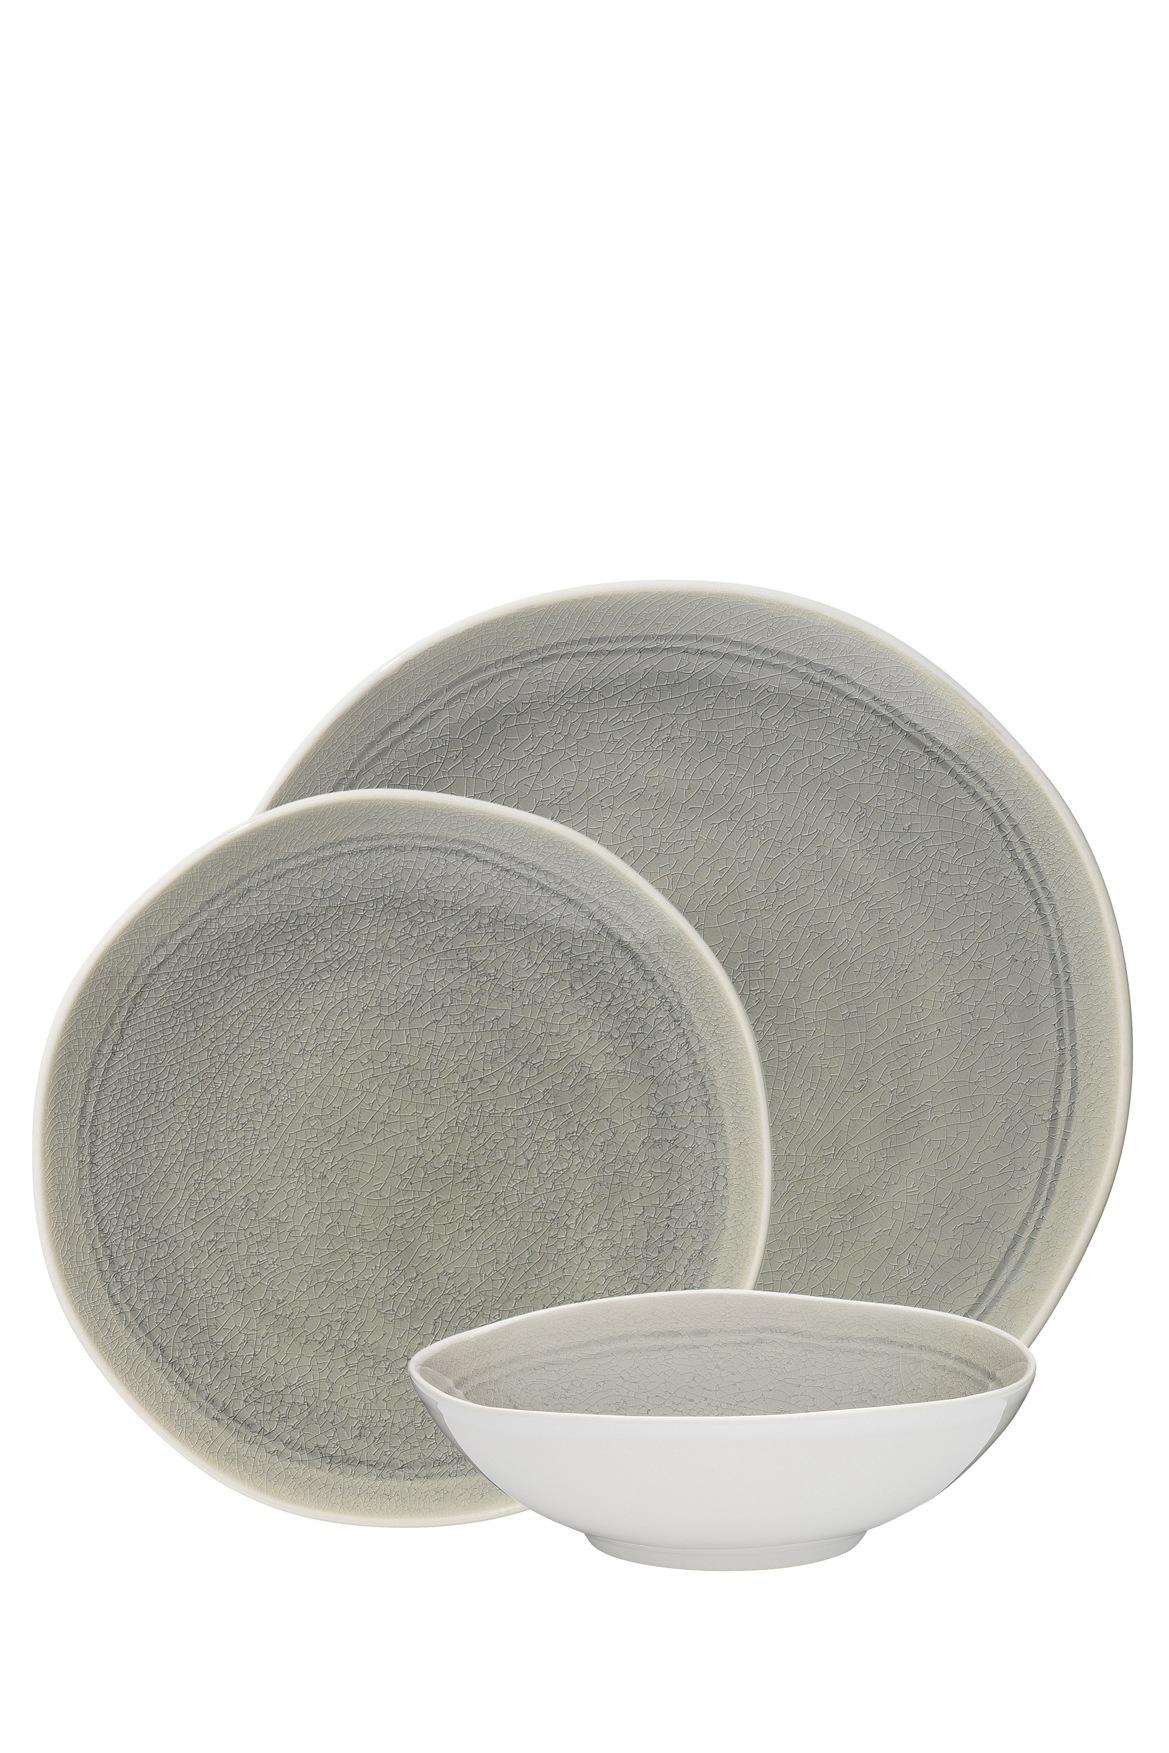 sc 1 st  Myer & Ecology | Linea 12 Piece Dinner Set - Mineral | Myer Online